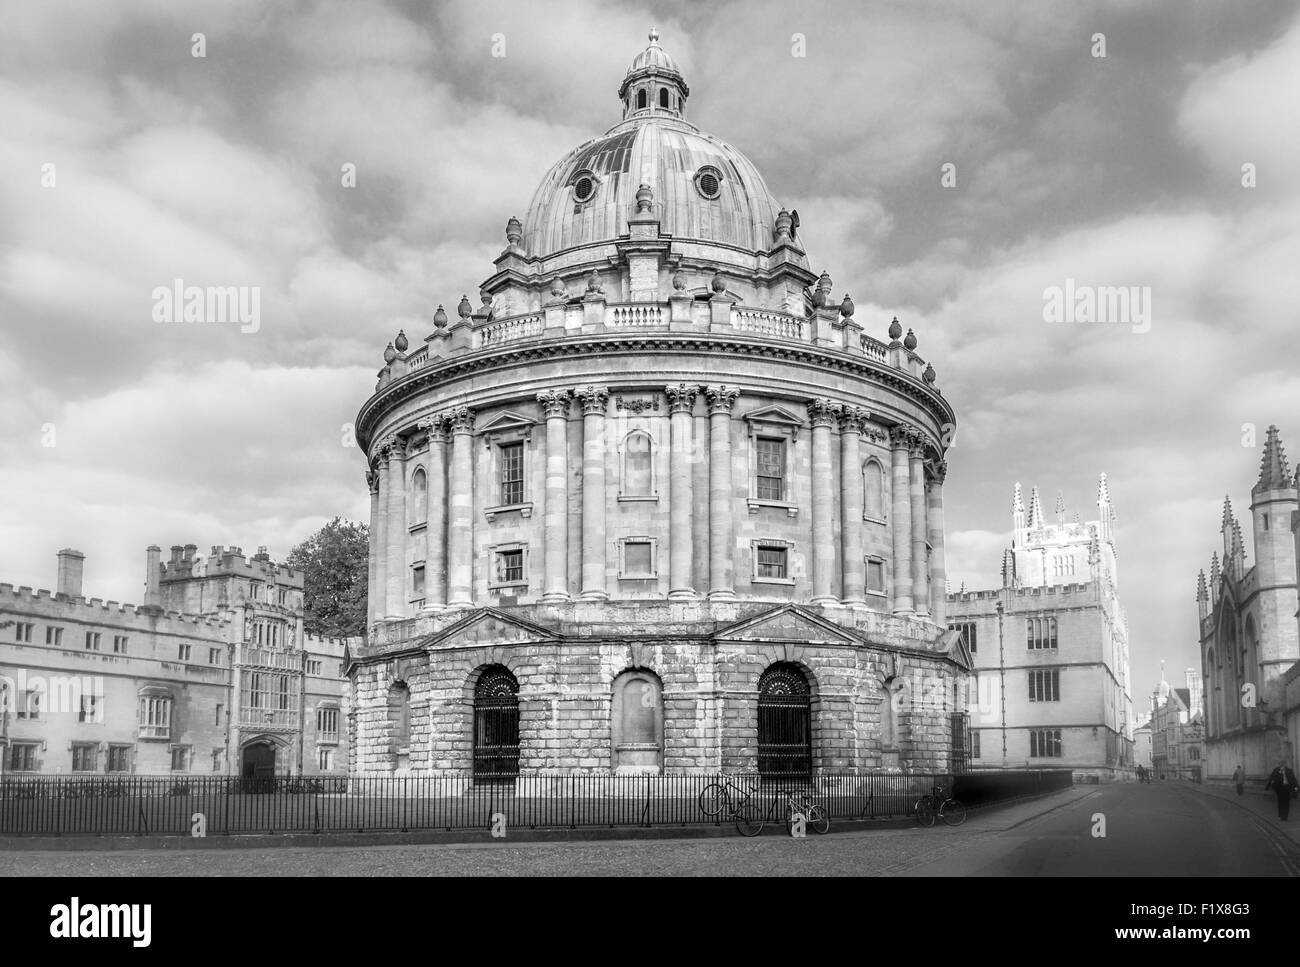 Radcliffe Camera, Oxford University, United Kingdom - Stock Image